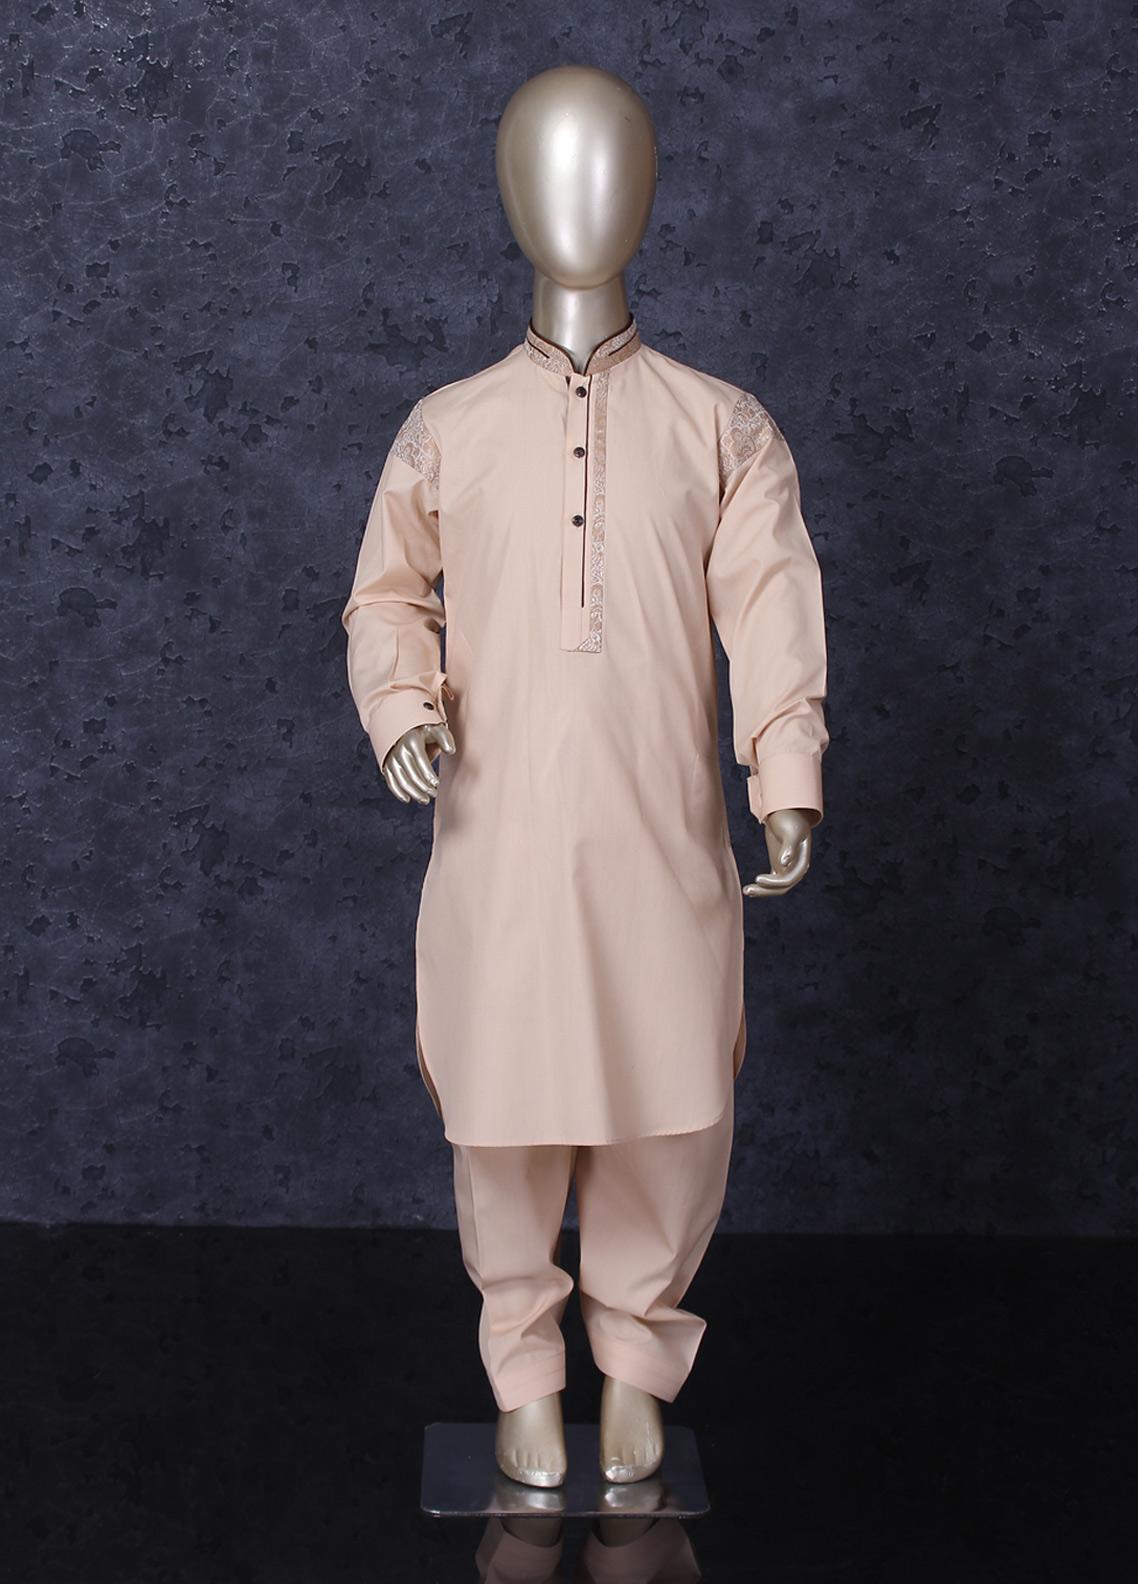 Aizaz Zafar Cotton Formal Boys Kameez Shalwar -  251 Beige